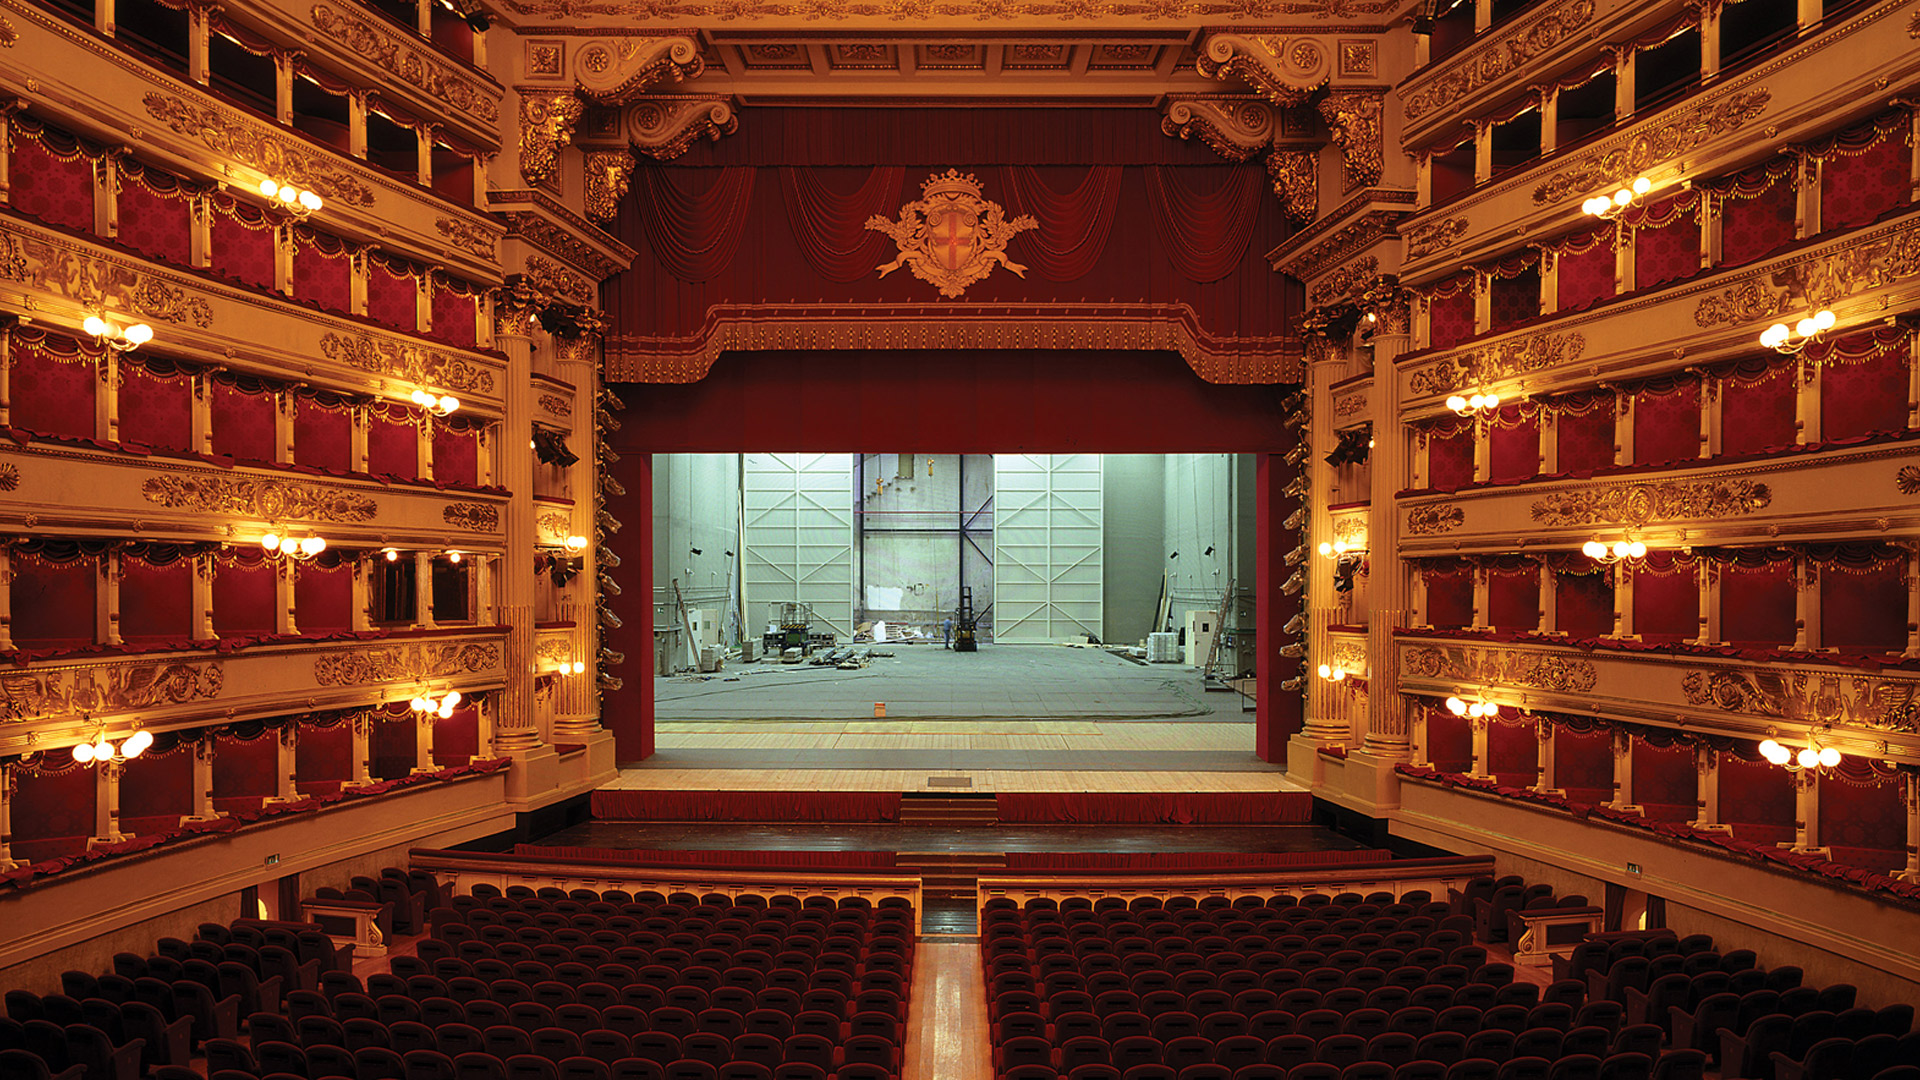 teatro alla scala renovation